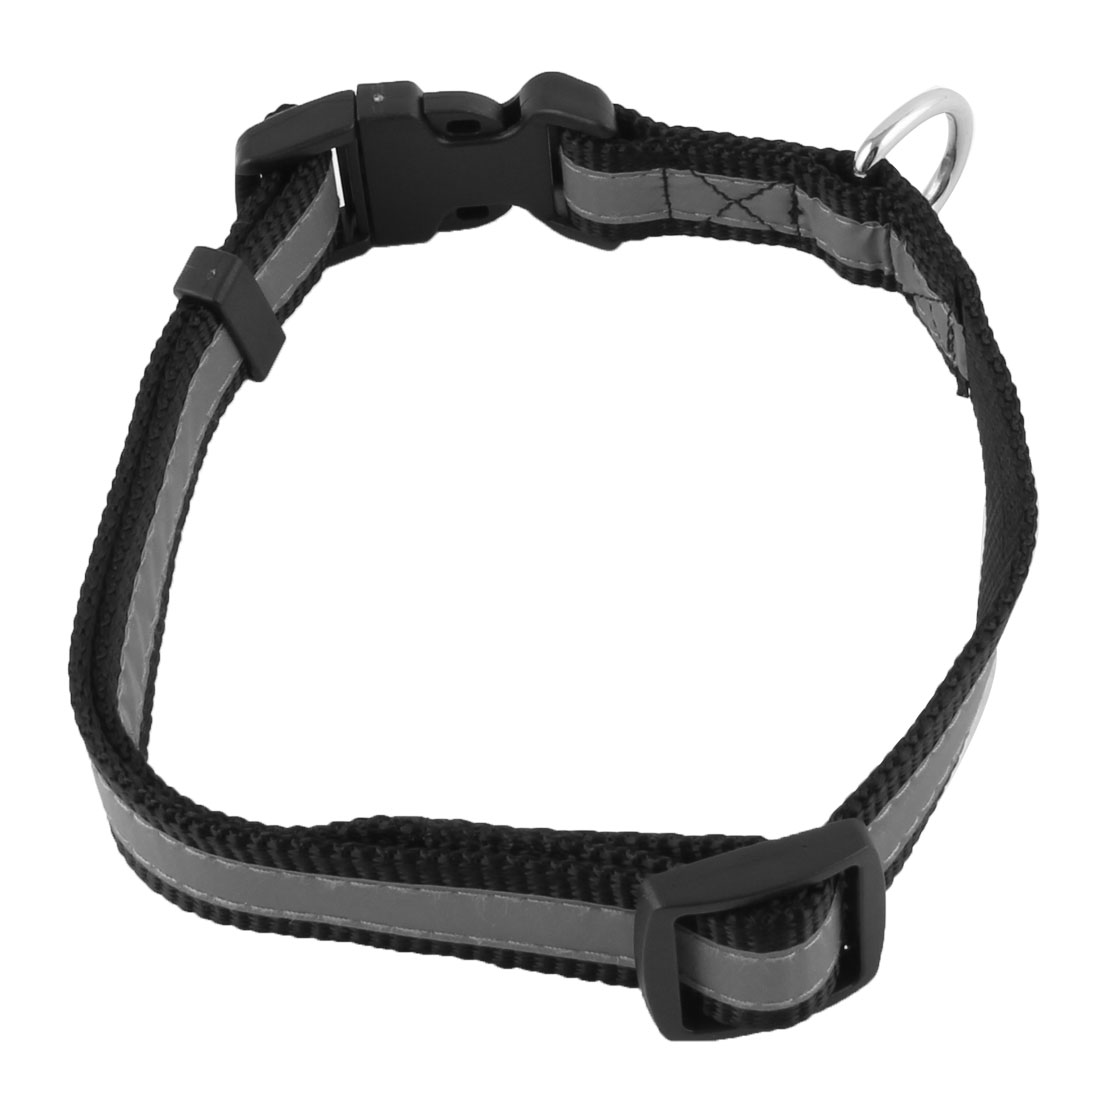 Pet Dog Puppy Nylon Reflective Adjustable Safty Buckle Neck Collar Strap Black